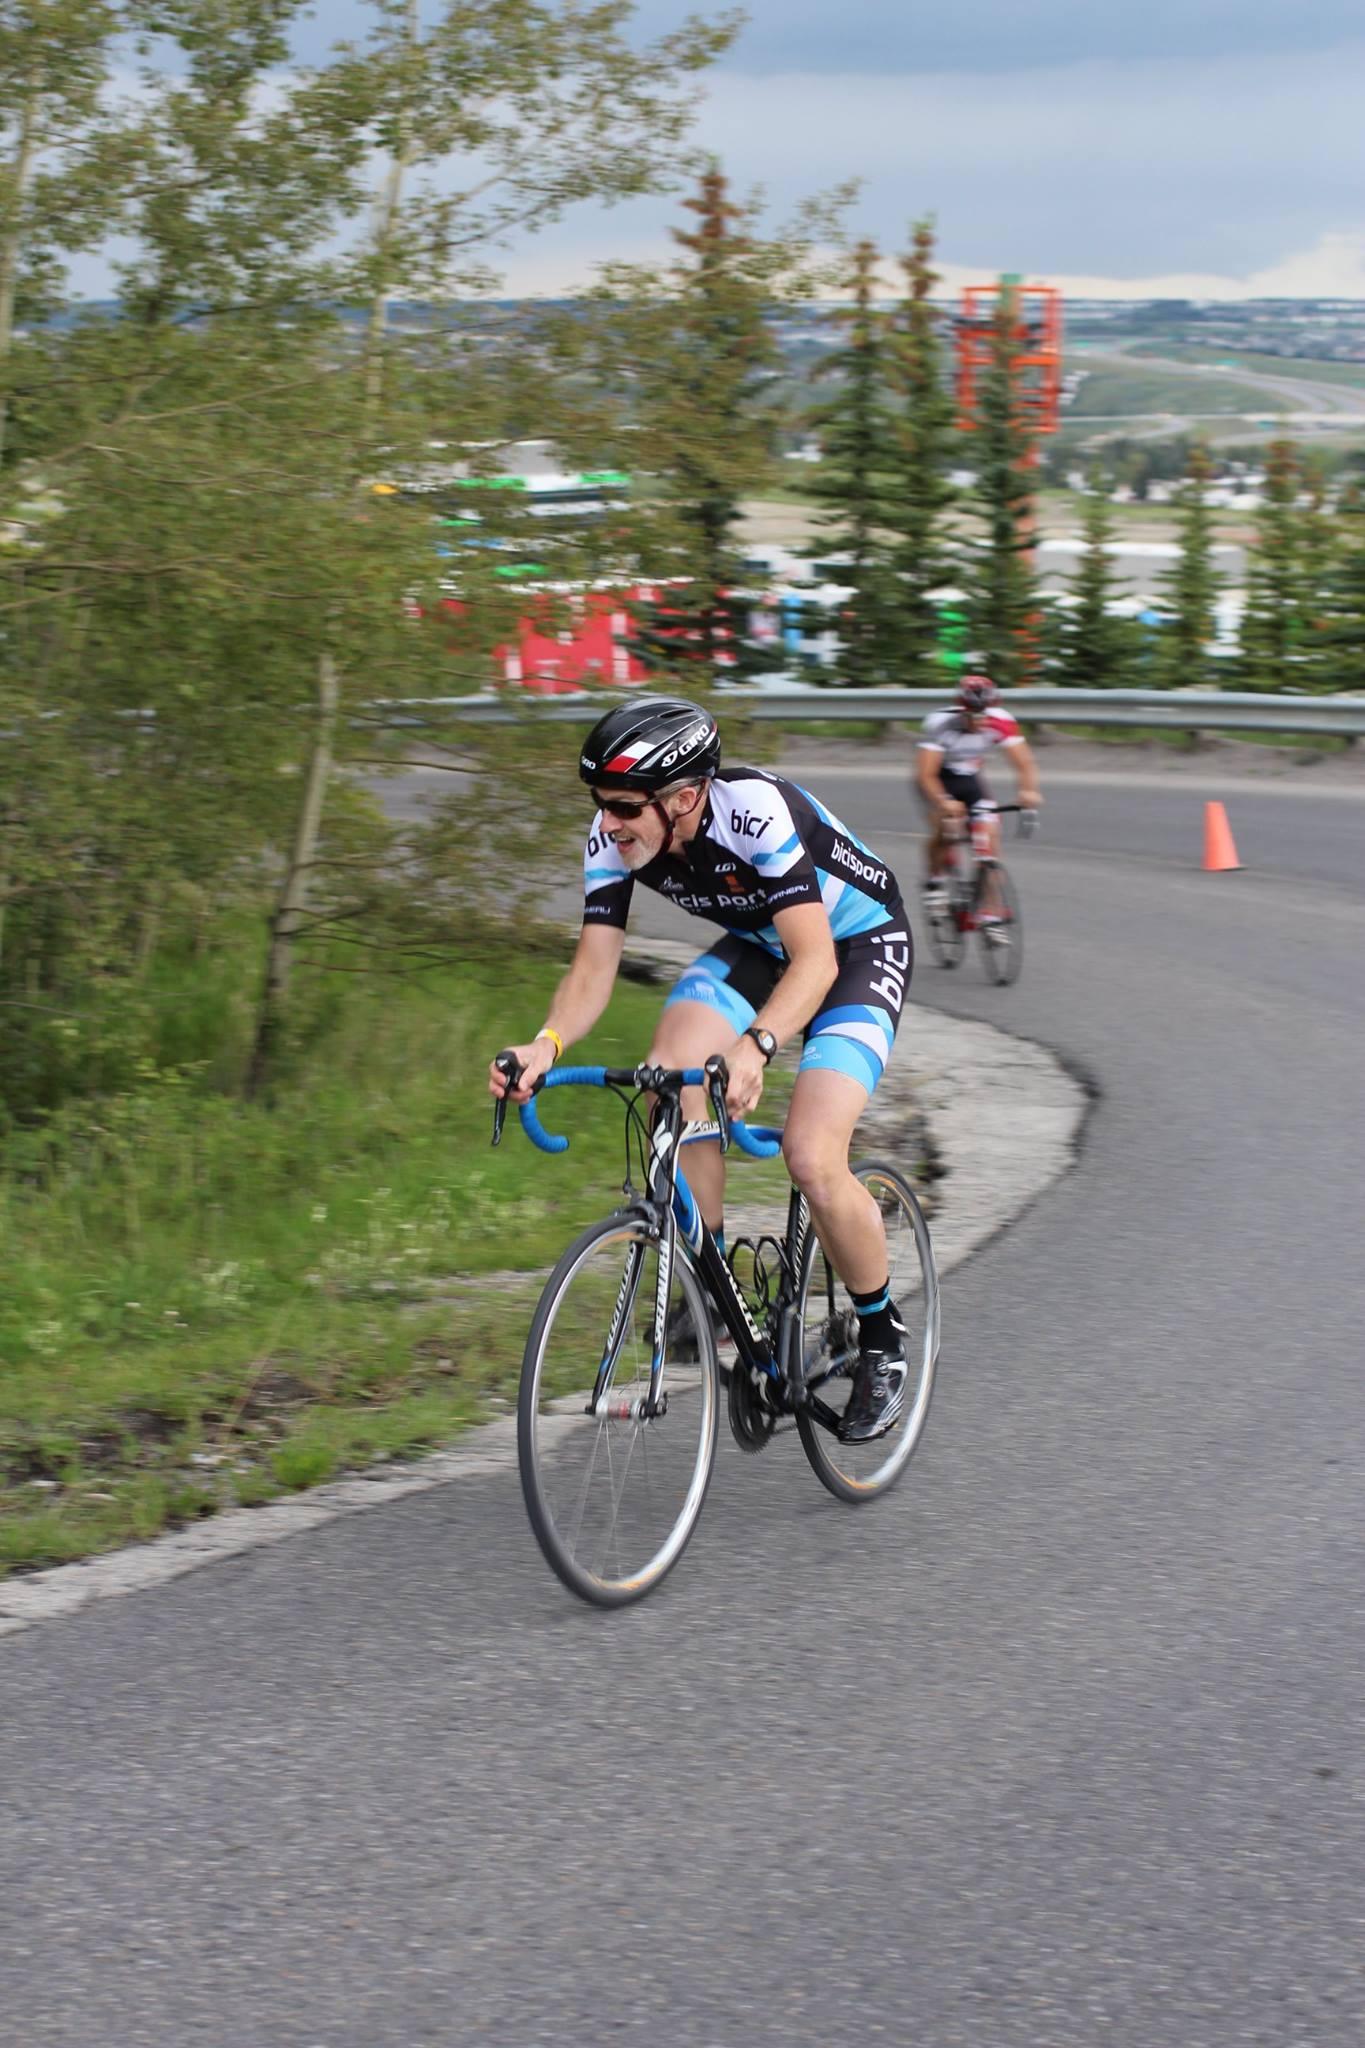 Bici Bucerias Puerto Vallarta Hill Climb - Tour de Bowness 2016